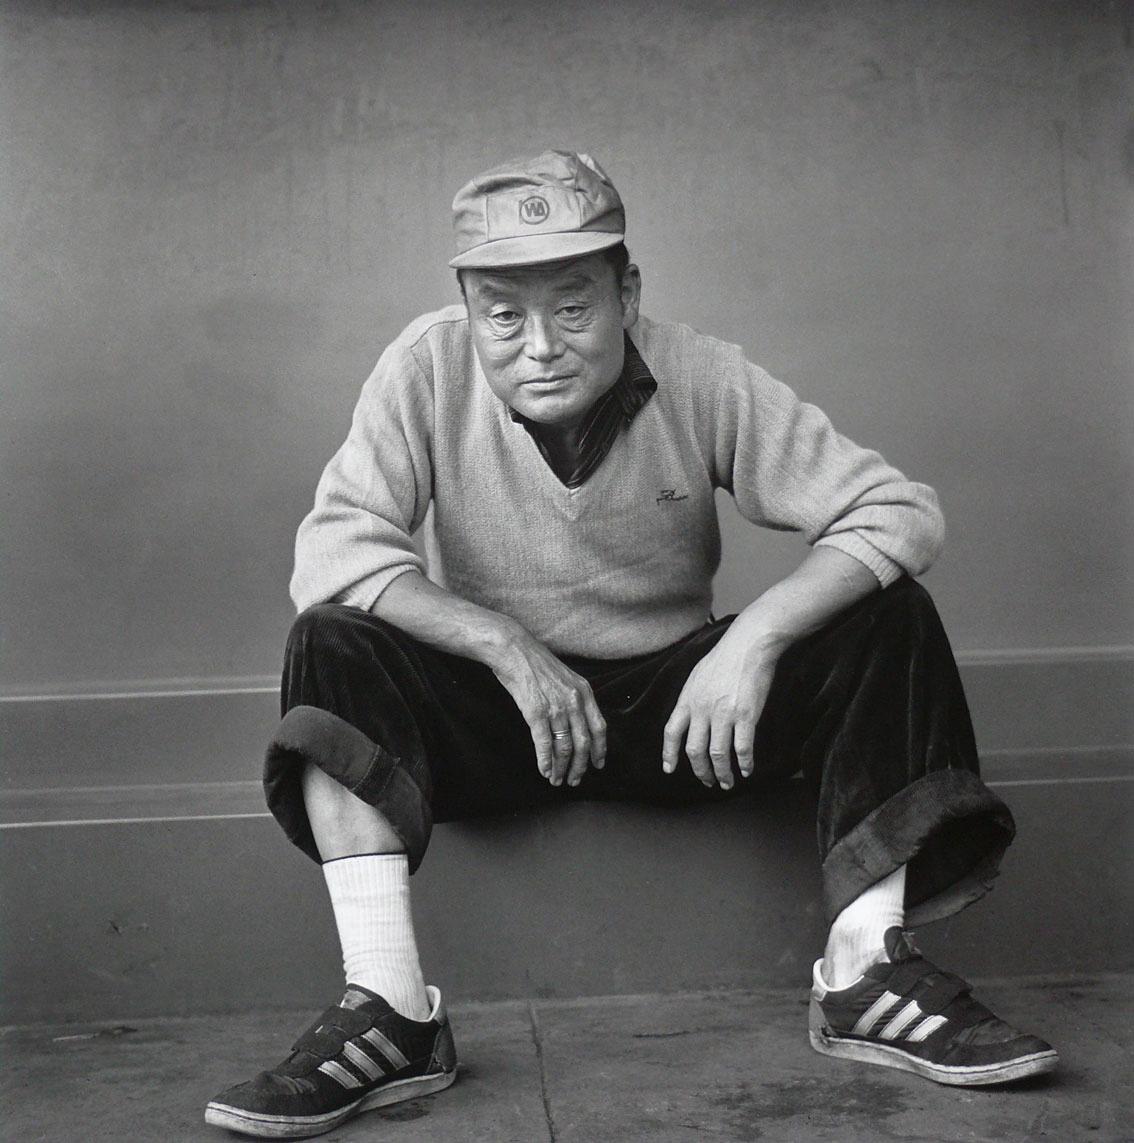 Hiroh kikai фотографа из токио япония